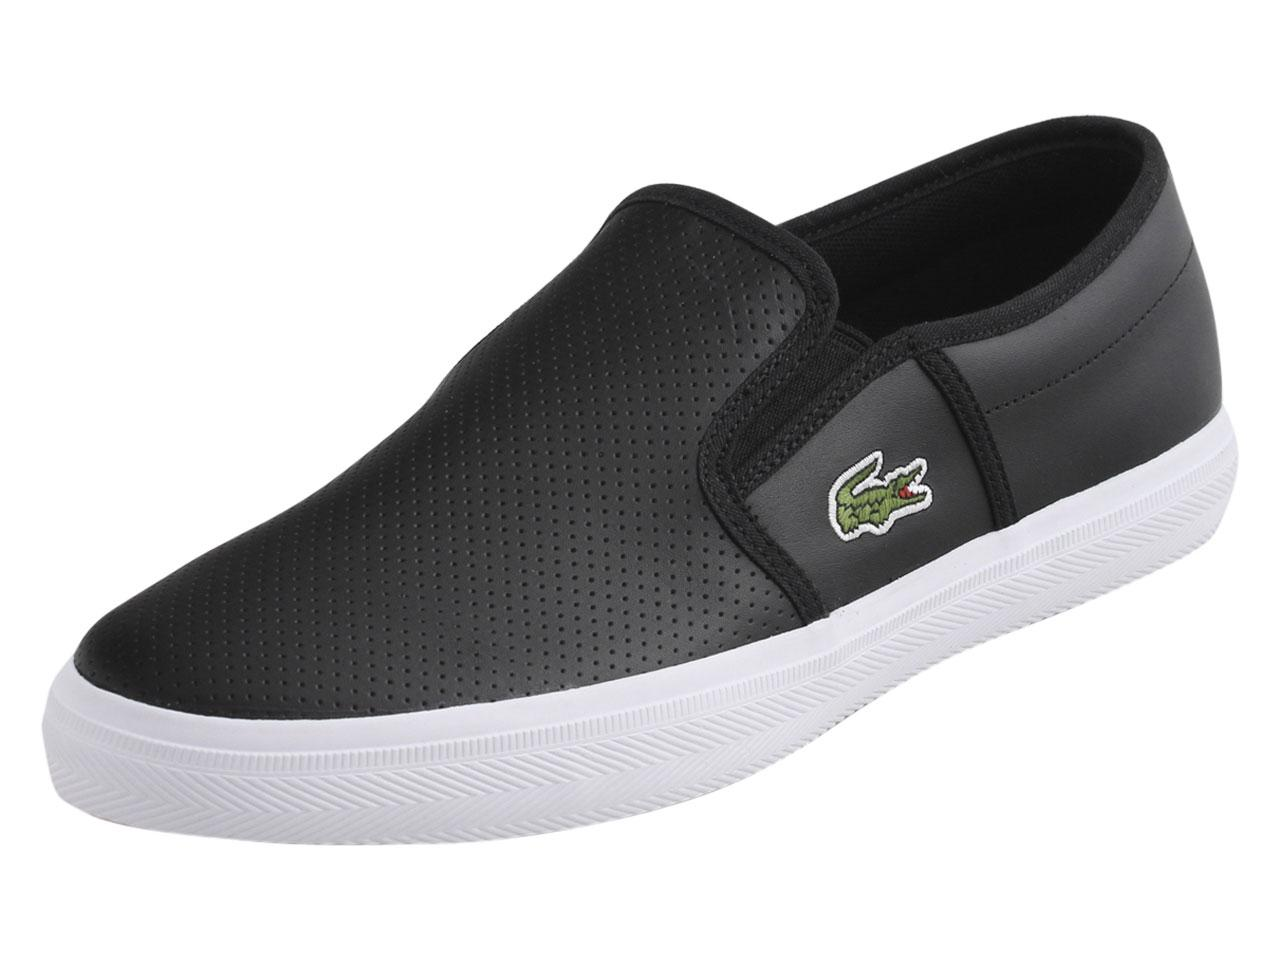 Lacoste Mens Gazon Bl 1 Sneaker Shoes Men